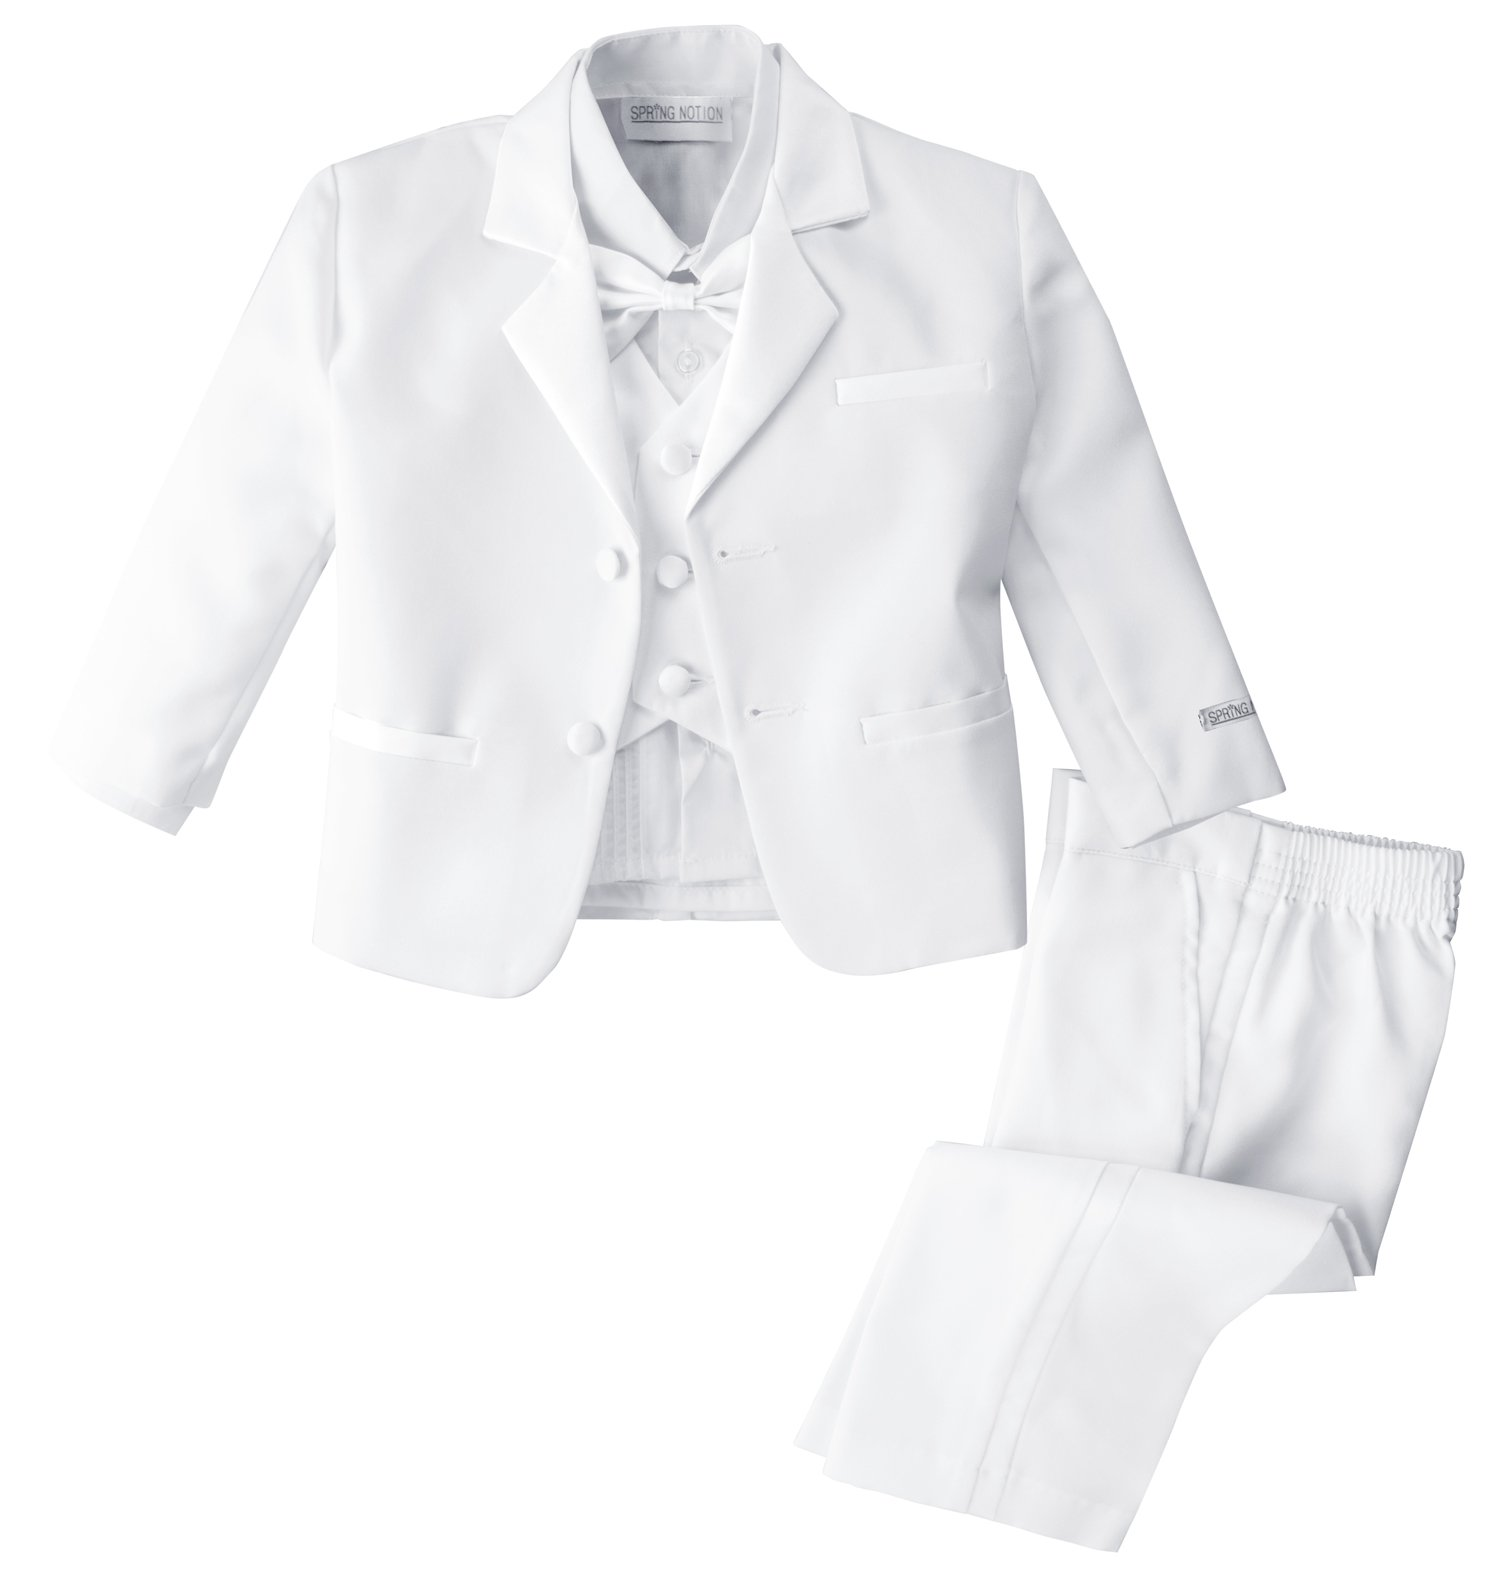 Spring Notion Baby Boys' White Classic Fit Tuxedo Set, No Tail 9M